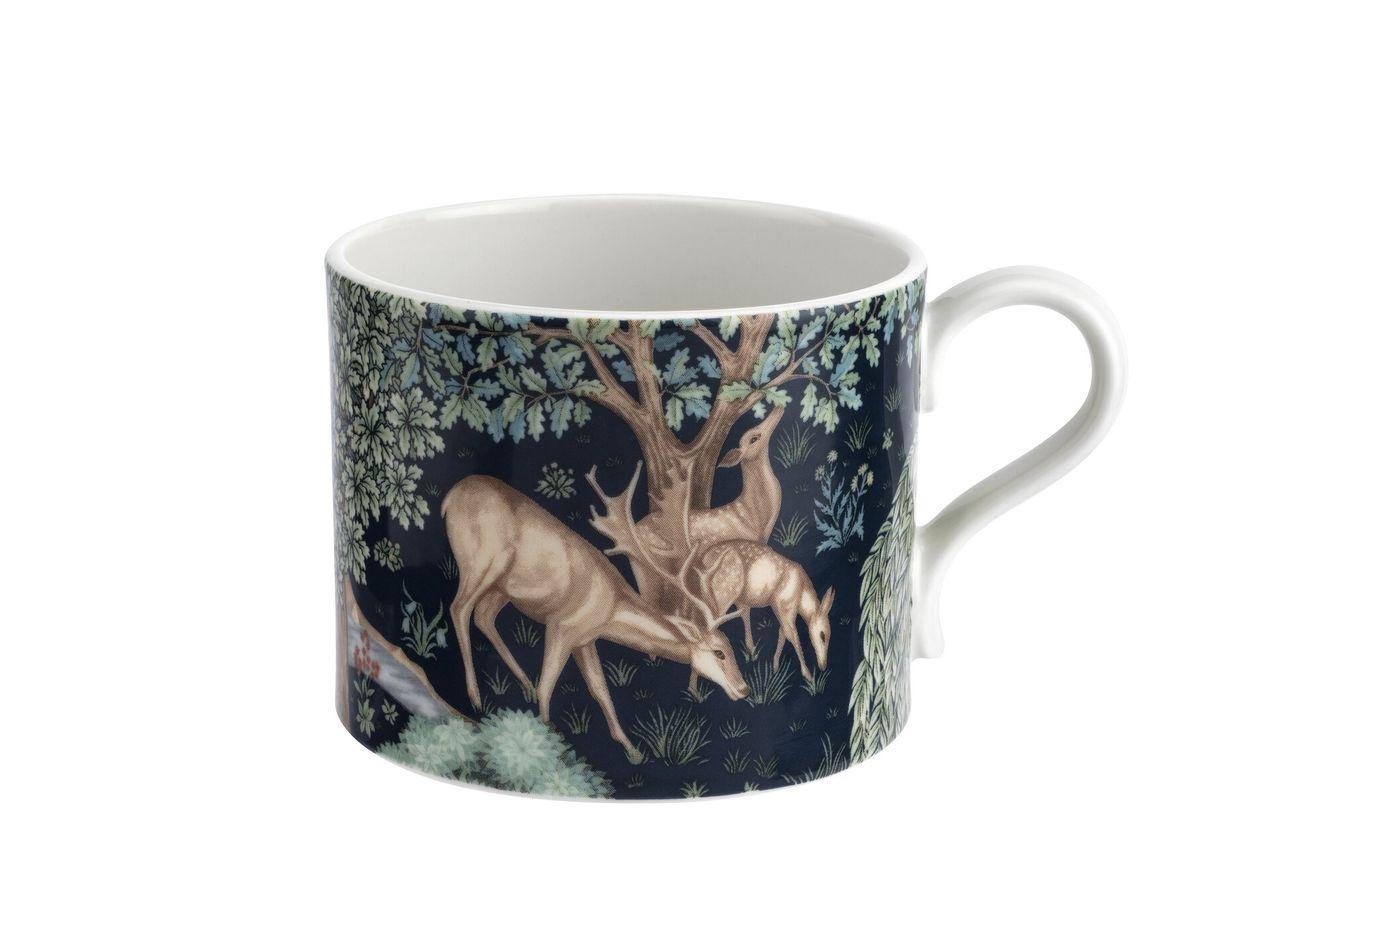 Spode The Original Morris & Co. Mug - Set of 2 Brook & Acanthus 0.34l thumb 3